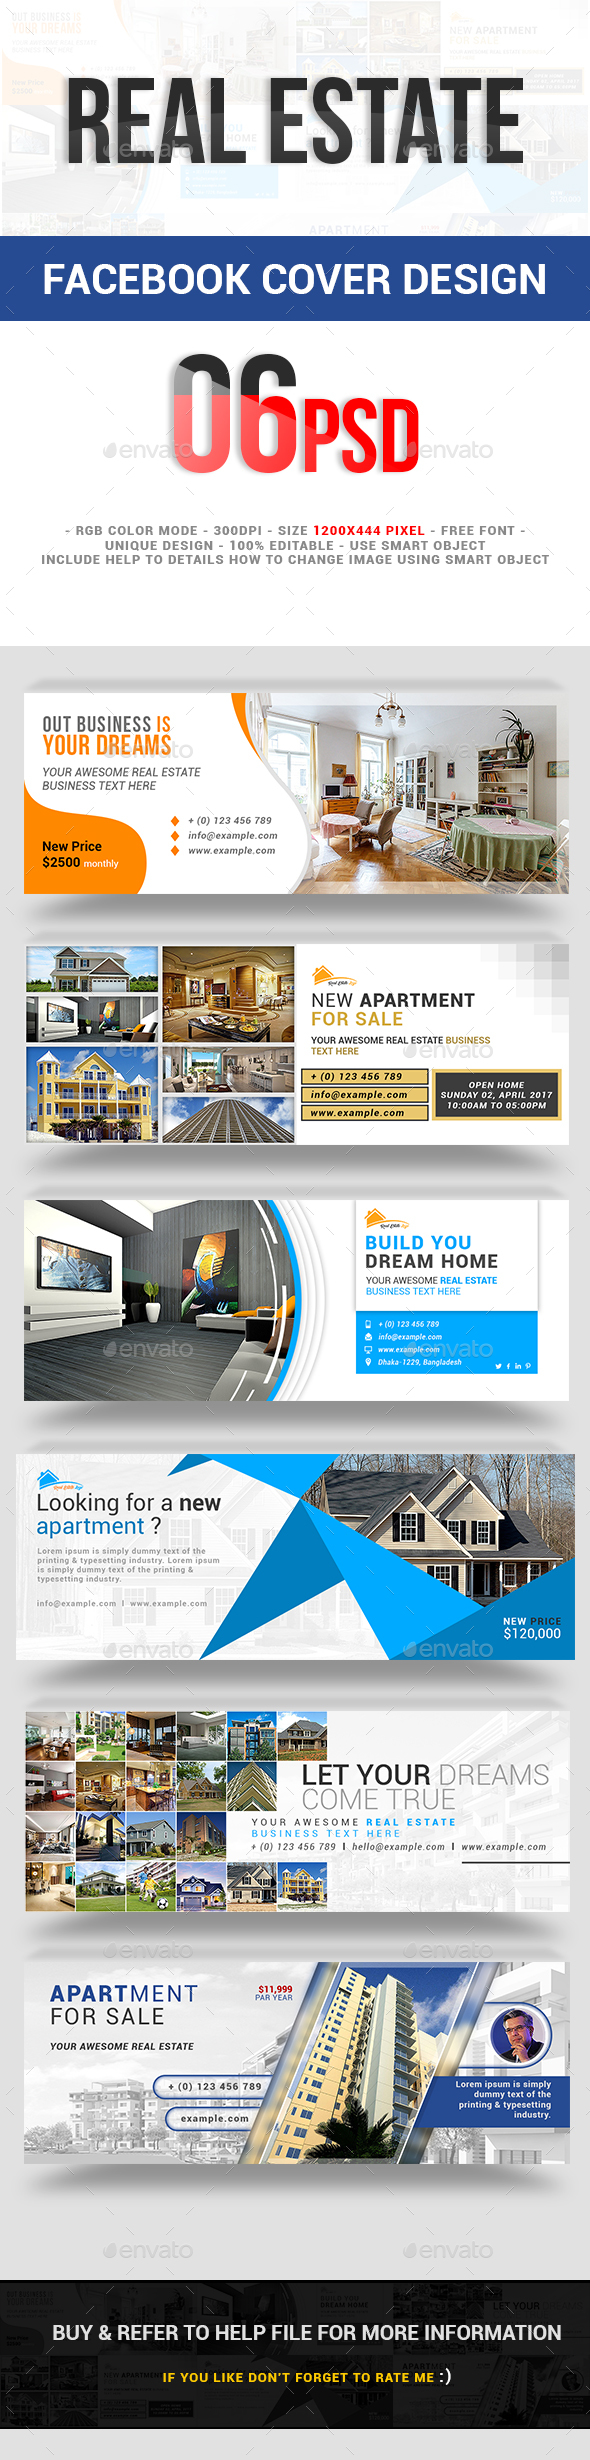 Real Estate Facebook Cover Design - Social Media Web Elements